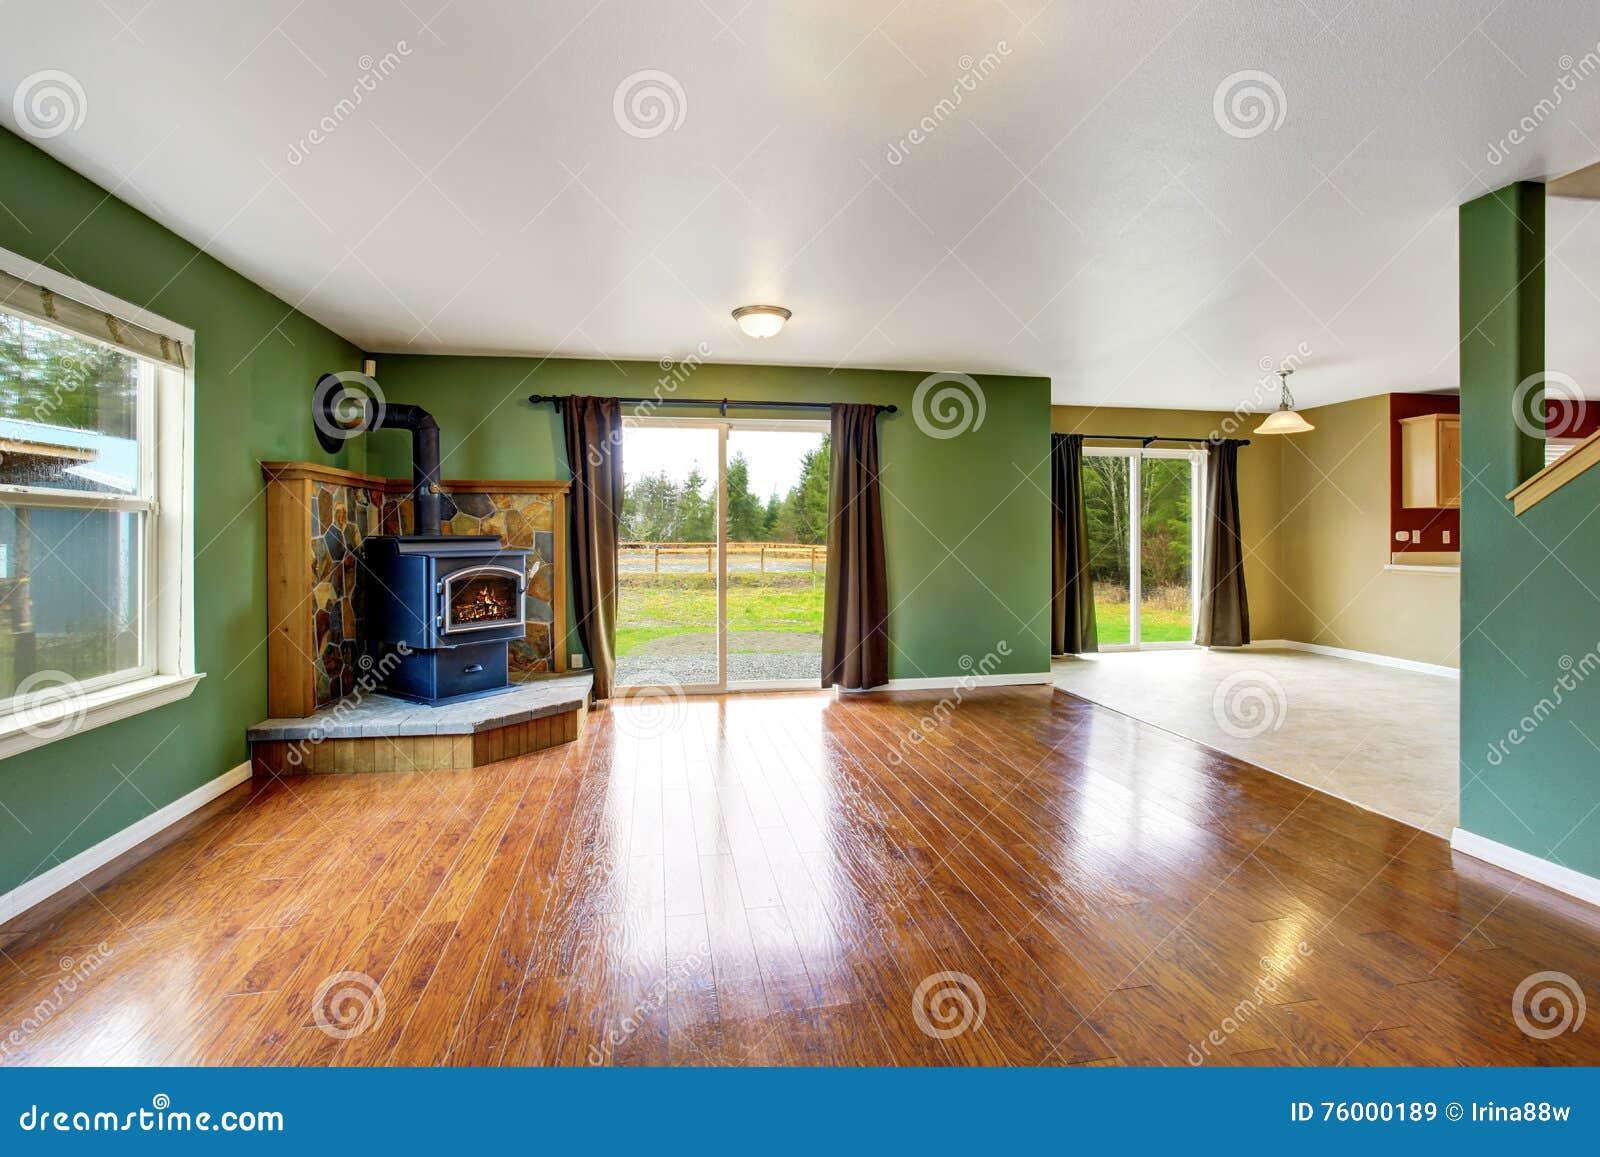 Open Floor Plan Interior With Green Walls And Hardwood Floor Stock Image Image Of Interior Home 76000189